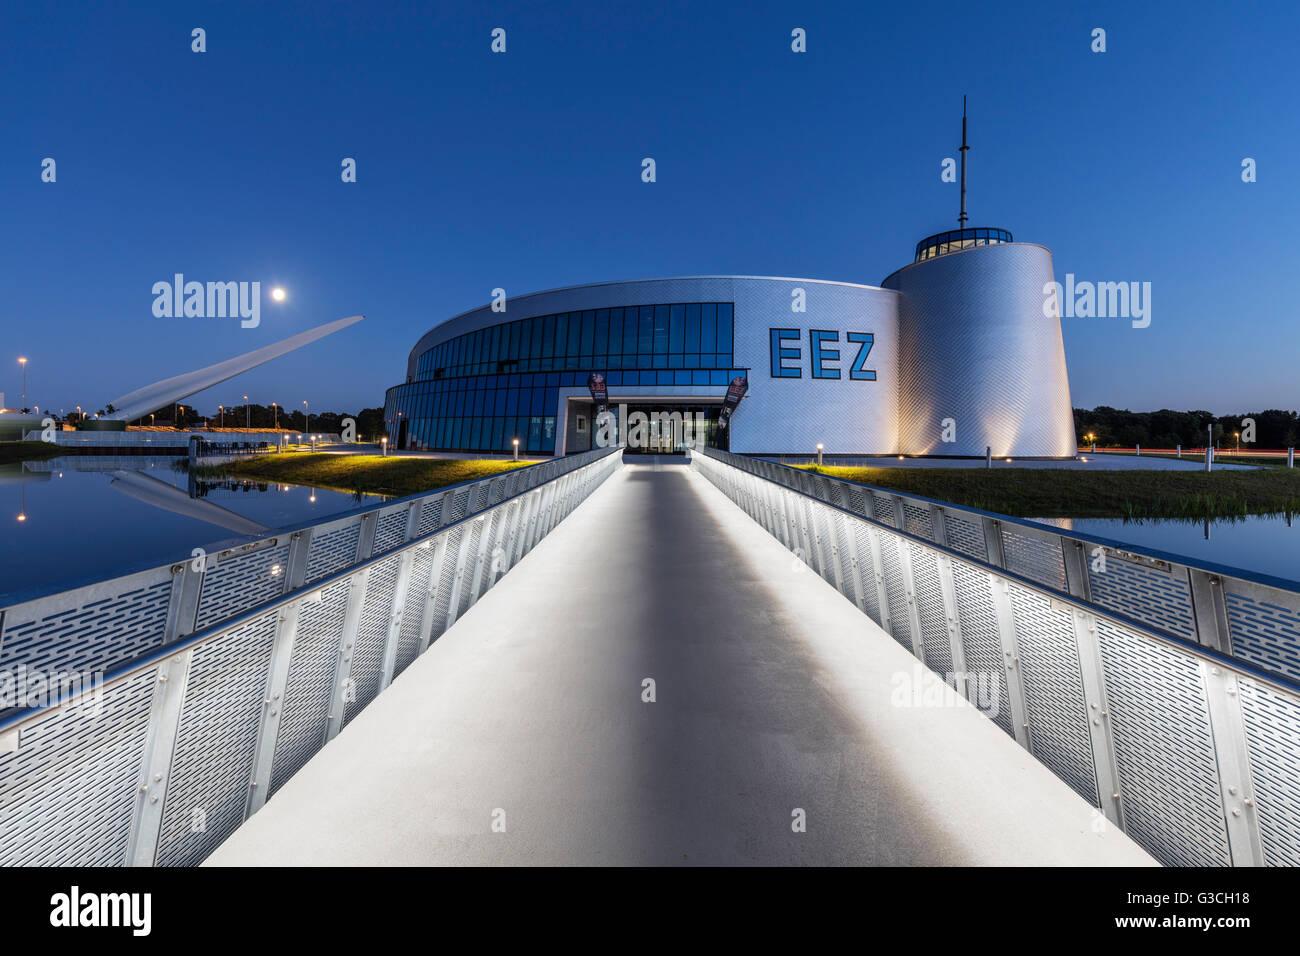 Evening mood, 'Energie-, Bildungs- und Erlebniszentrum', EEZ, (Energy, education and experience center), - Stock Image